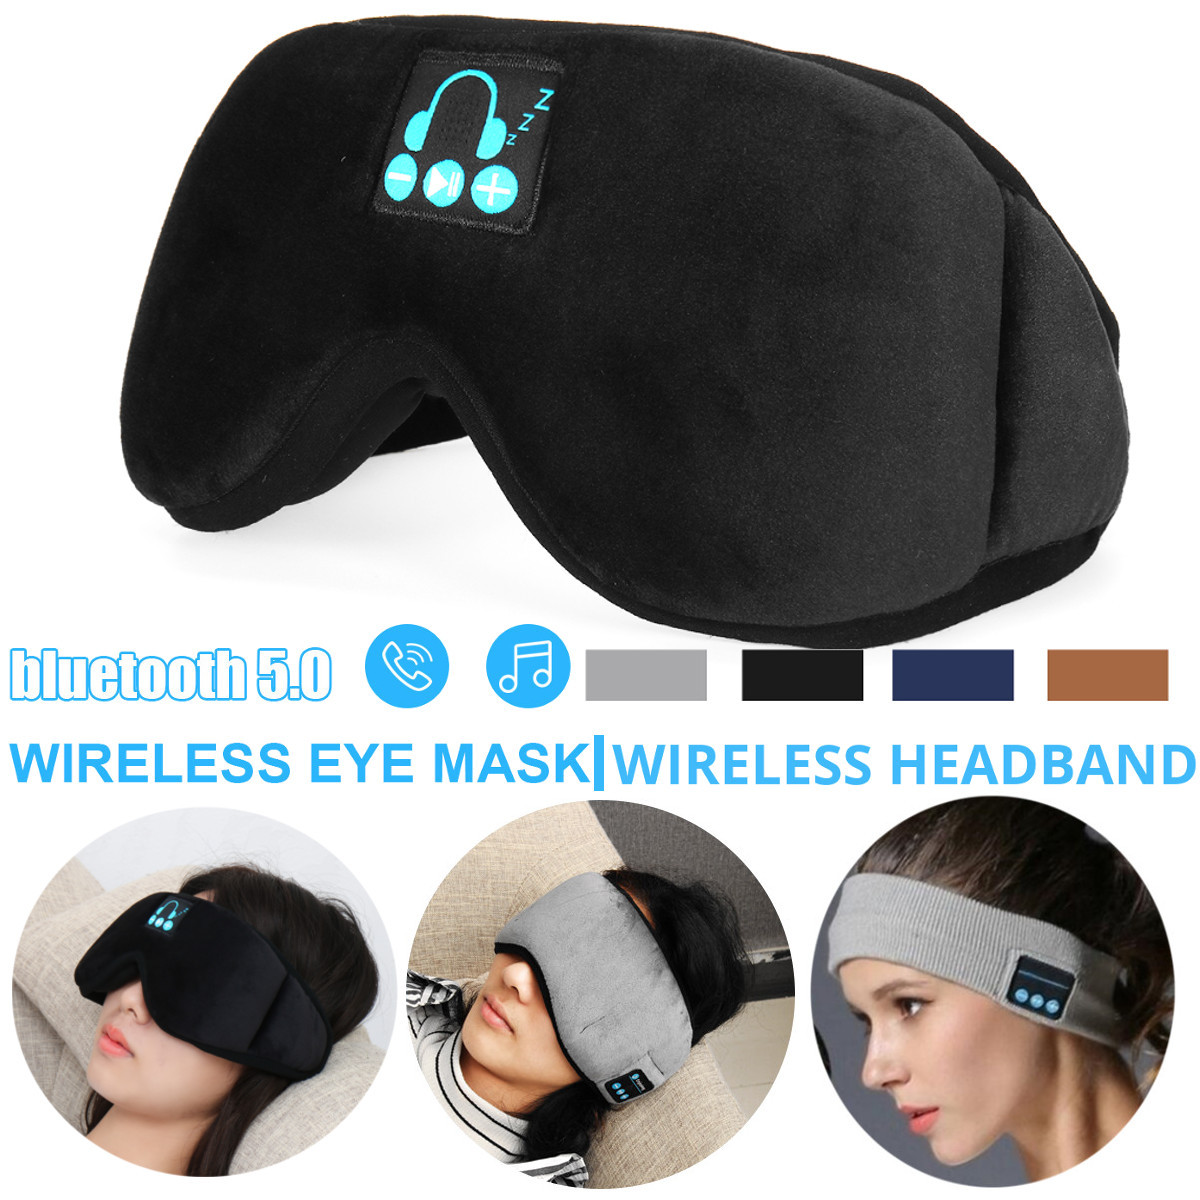 Sleep Headphone Bluetooth Sleep Mask Wireless Sleep Eye Mask Earphone Travel Eye Shades with Built-in Speakers Mic Handsfree mic